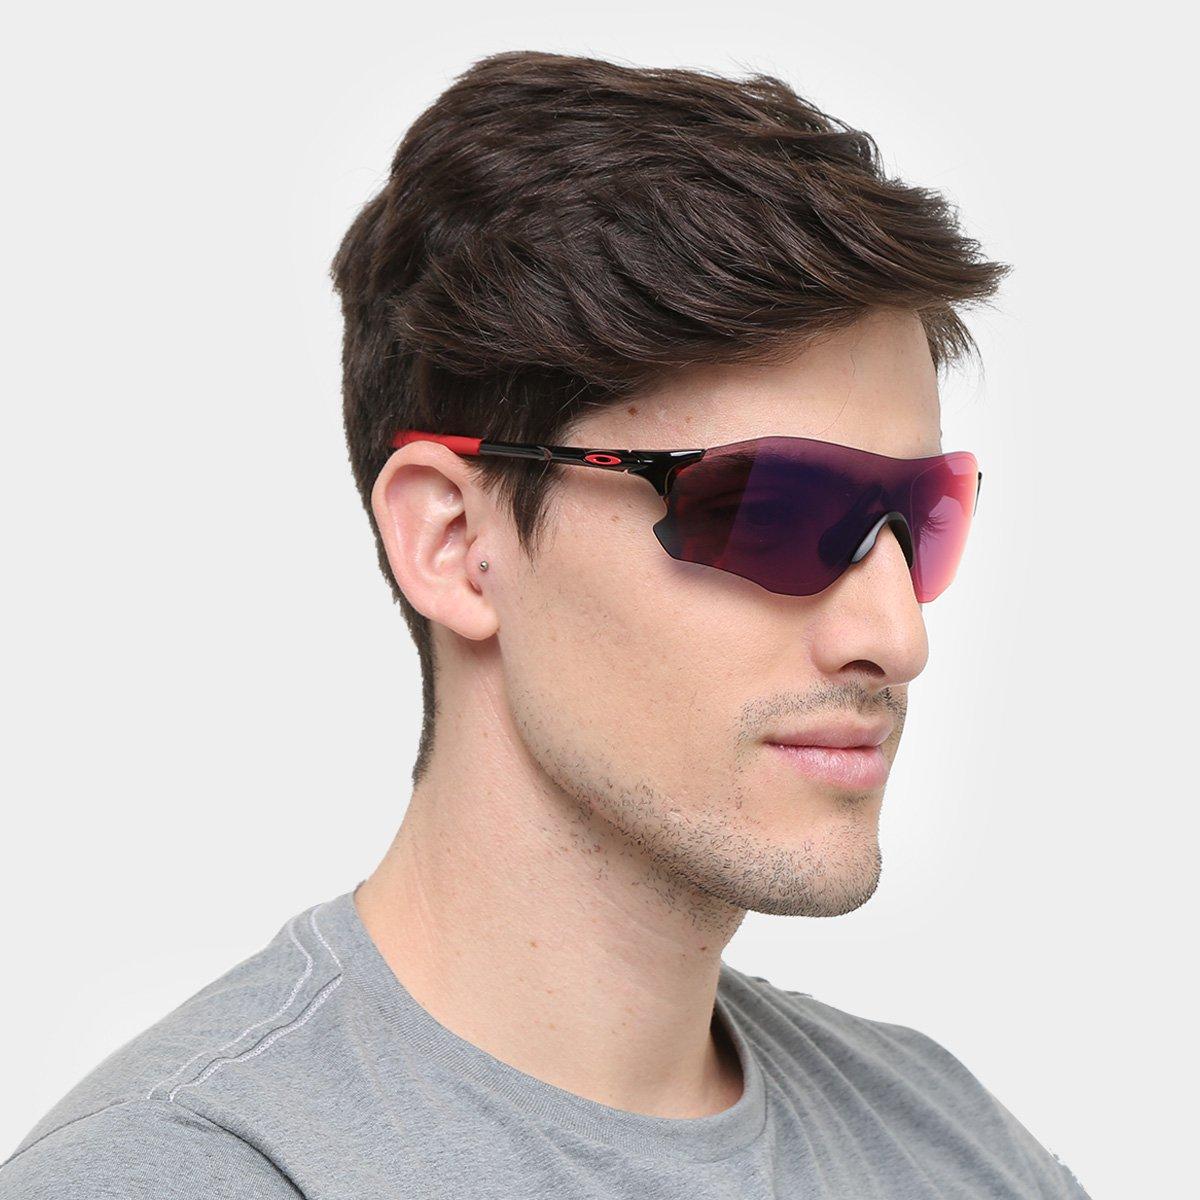 Óculos Oakley Evzero Path Prizm Road - Compre Agora   Netshoes b7504c5e5e